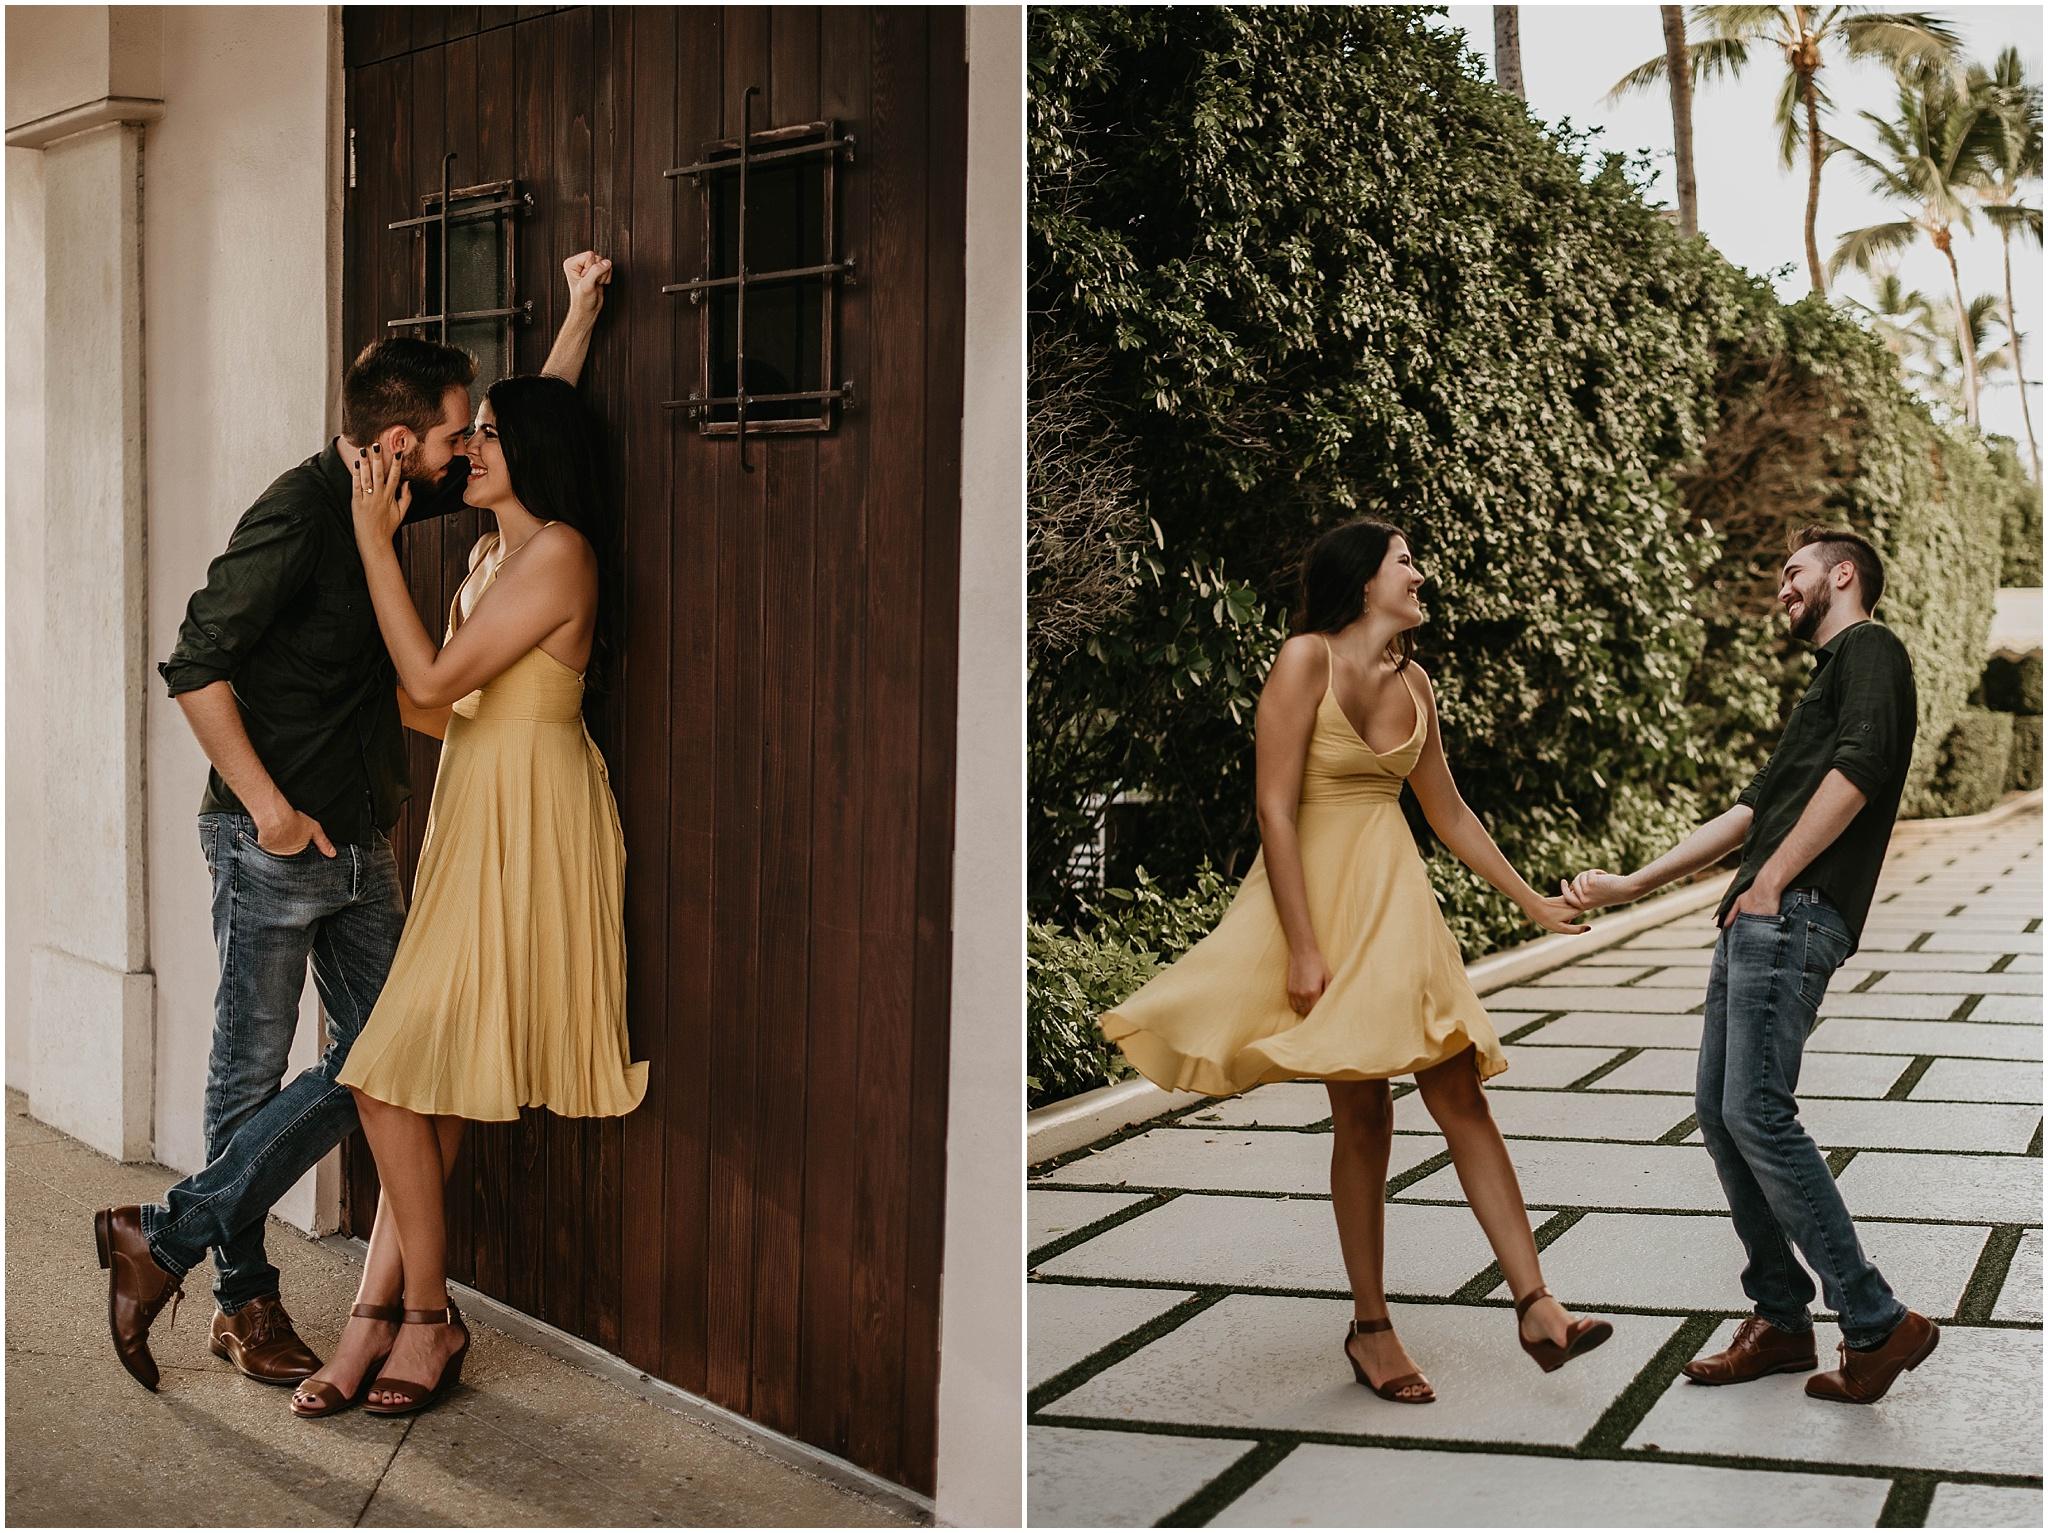 Worth-Avenue-Palm-Beach-engagement-photographer_0012.jpg